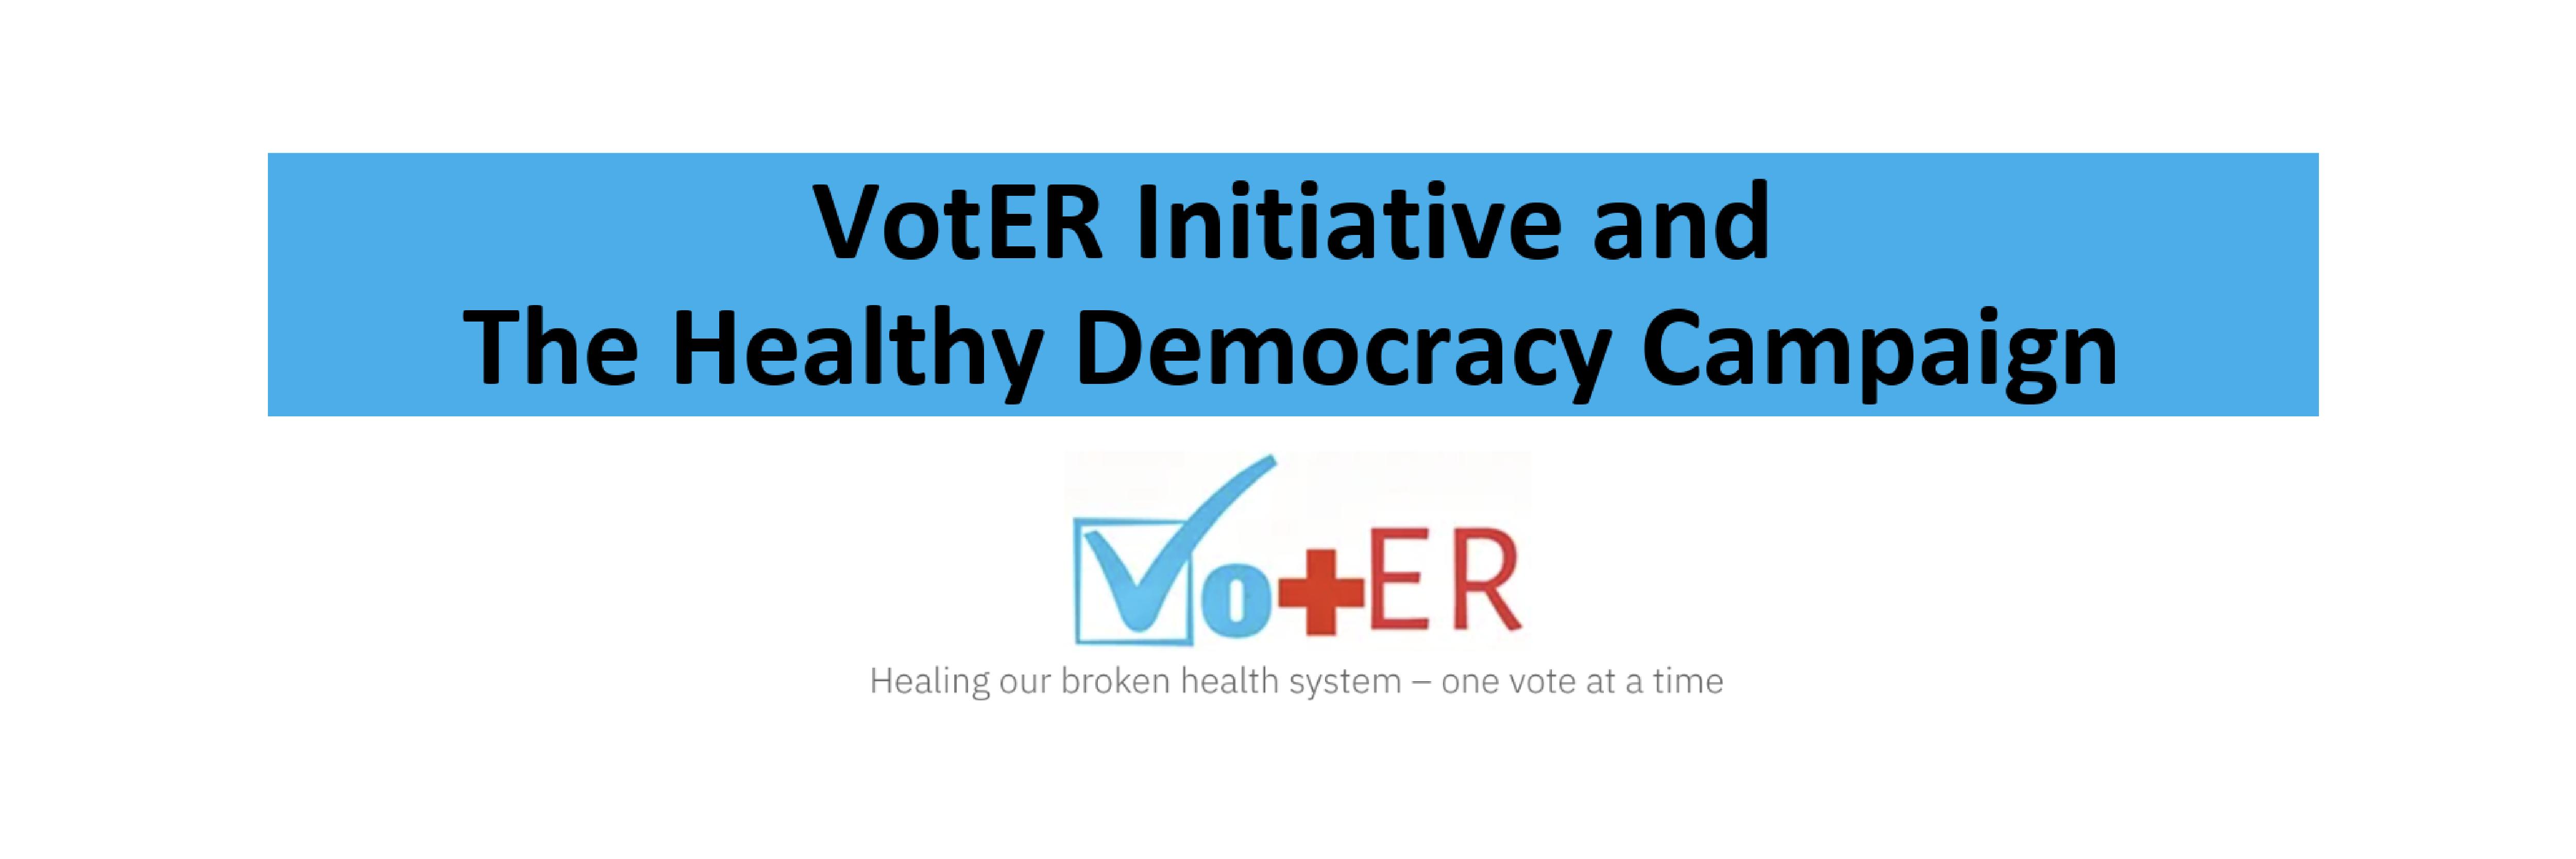 votER Initiative